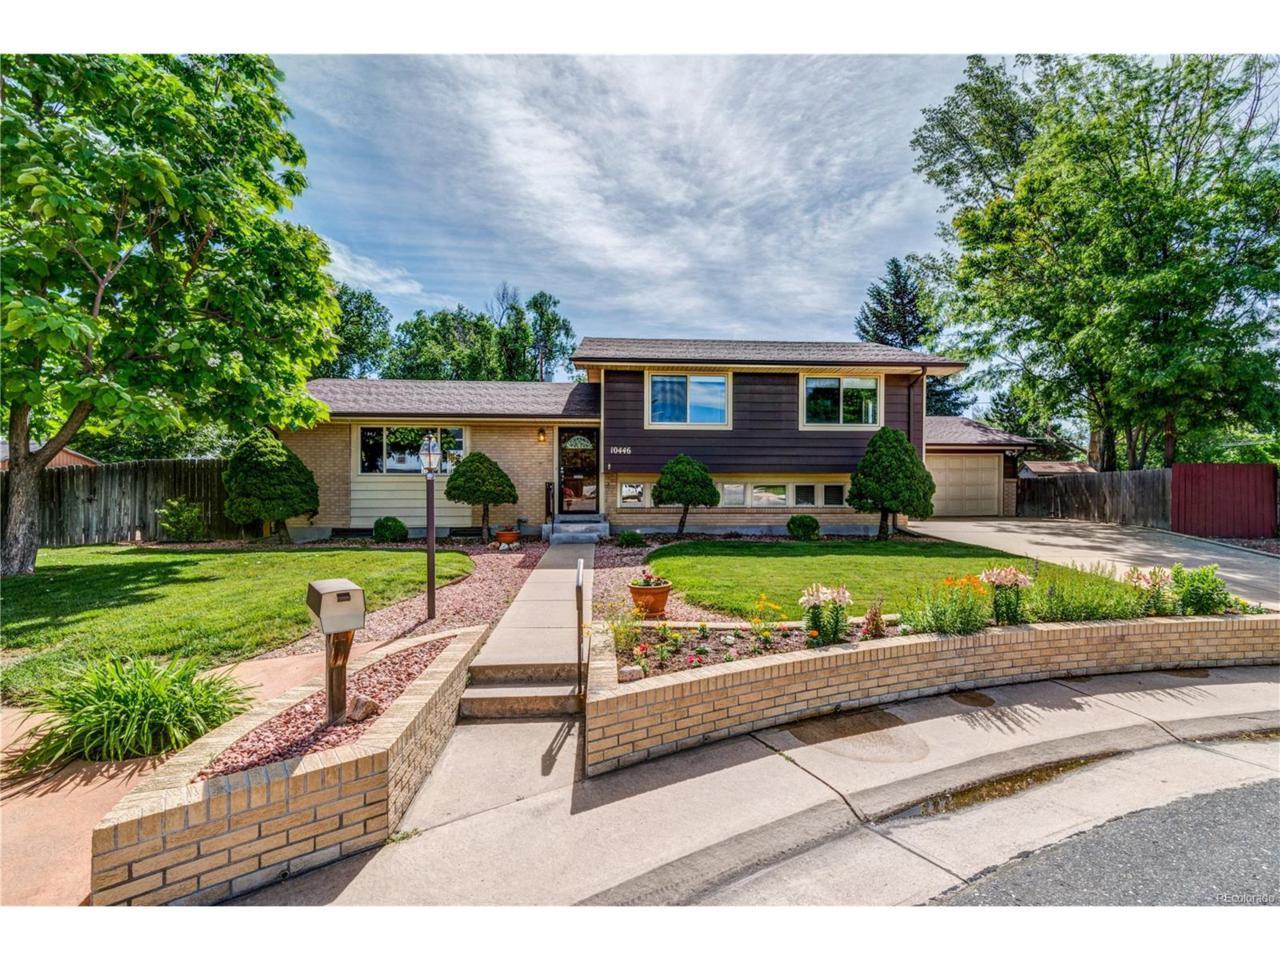 10446 Pompey Way, Northglenn, CO 80234 (MLS #8970936) :: 8z Real Estate